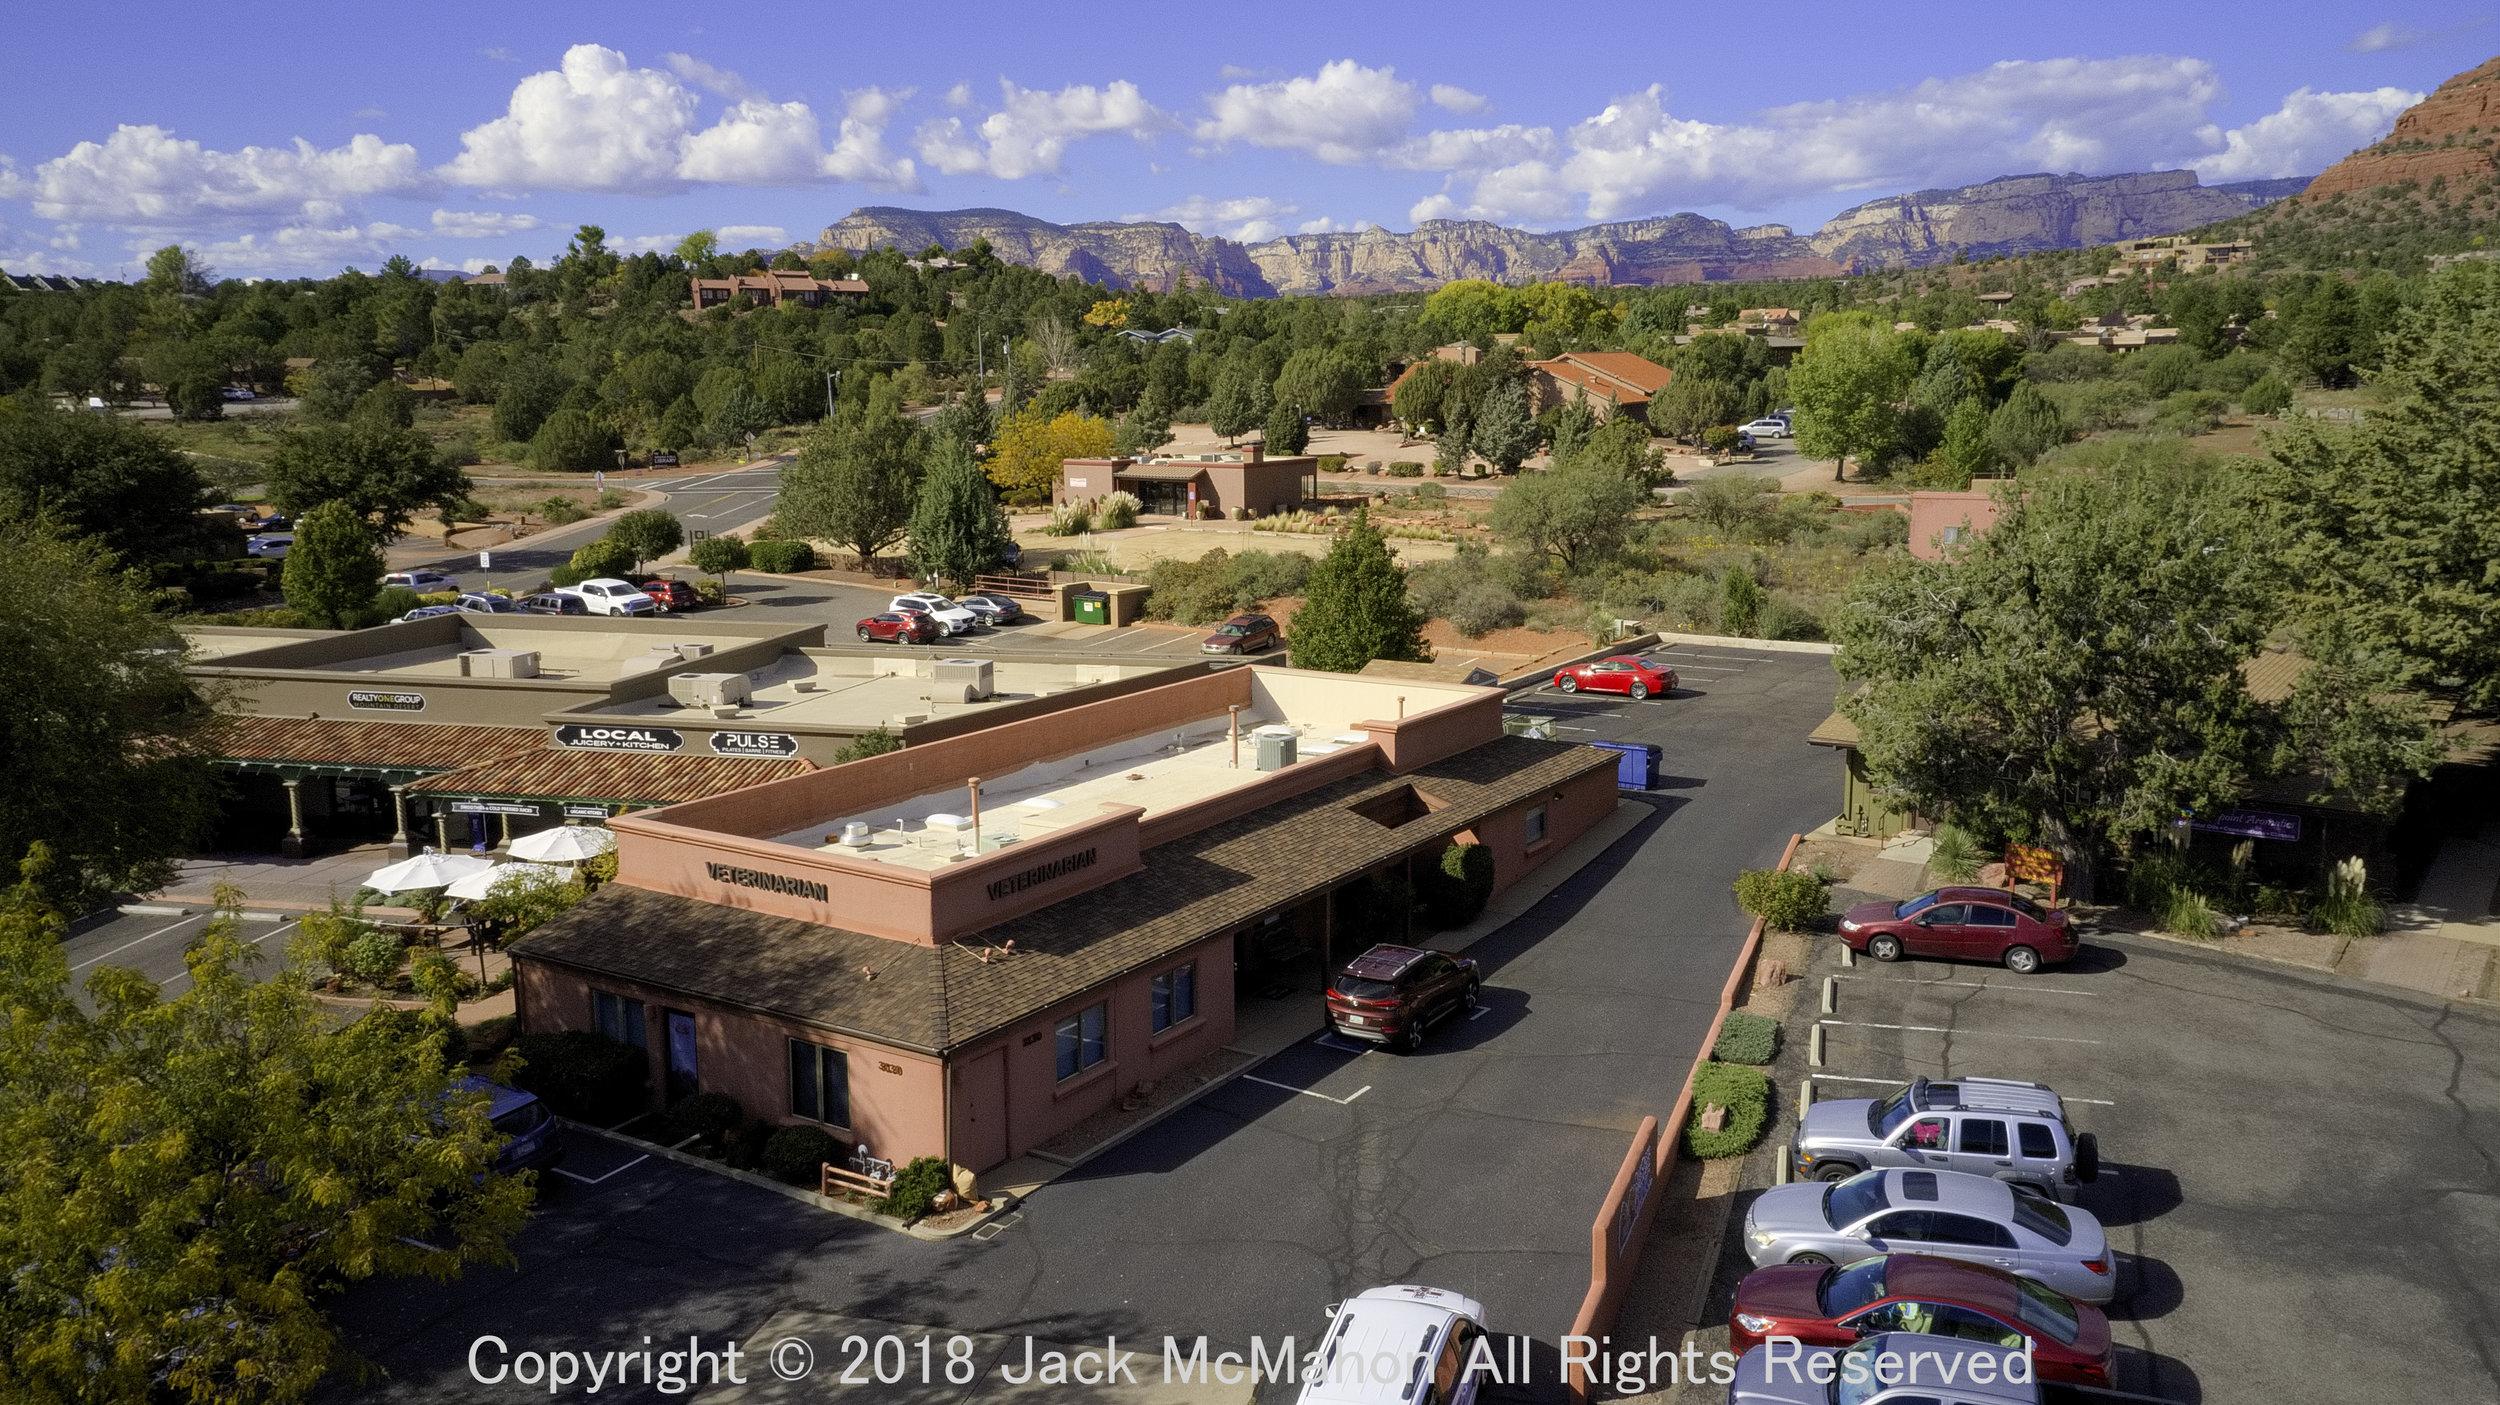 OAK CREEK SMALL ANIMAL CLINIC    3130 W SR 89A - SEDONA, AZ